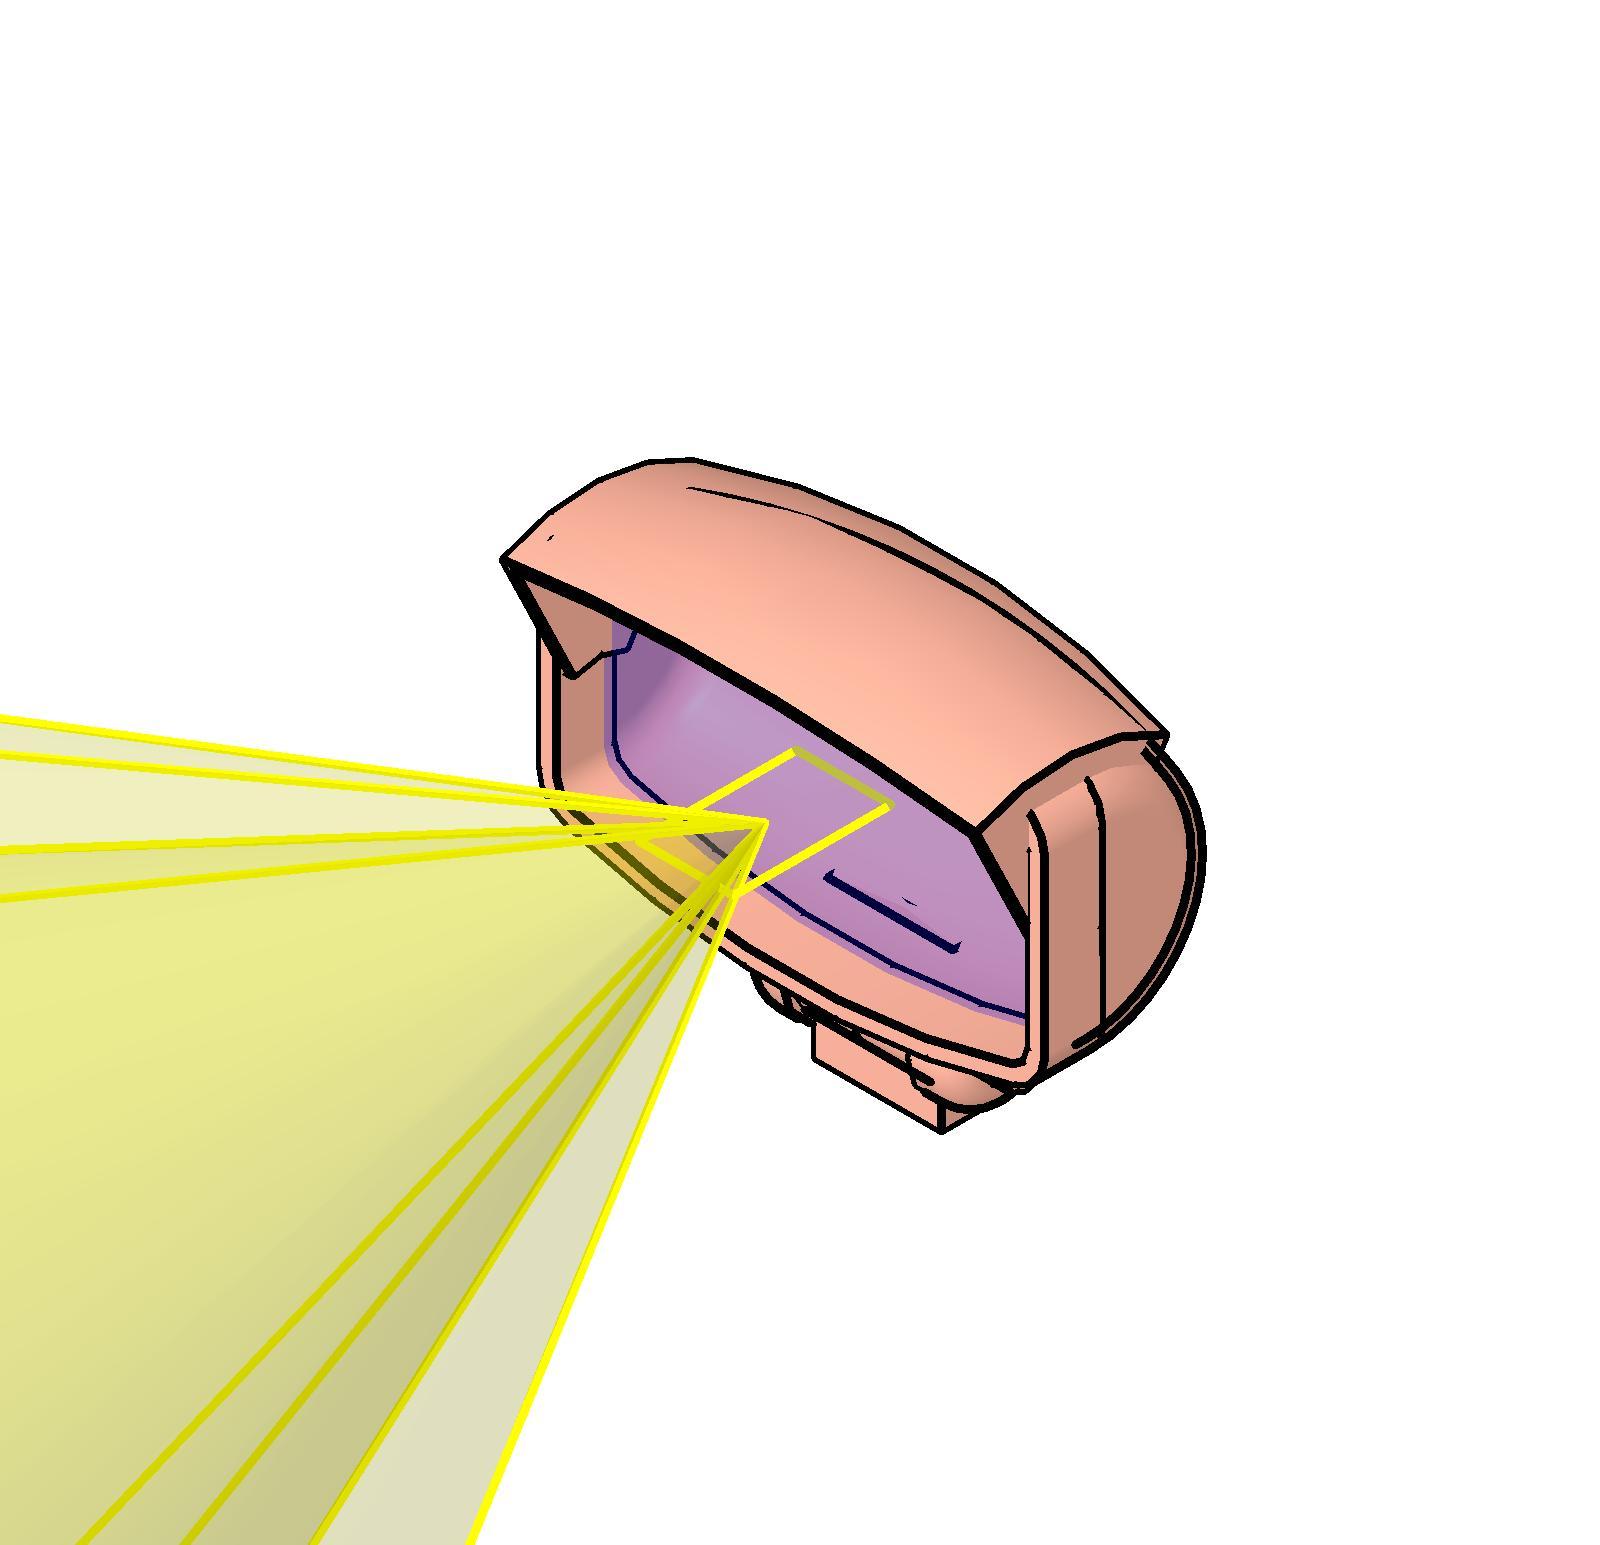 Outdoor Lighting Revit: Generic Exterior Lighting BIM Objects / Families